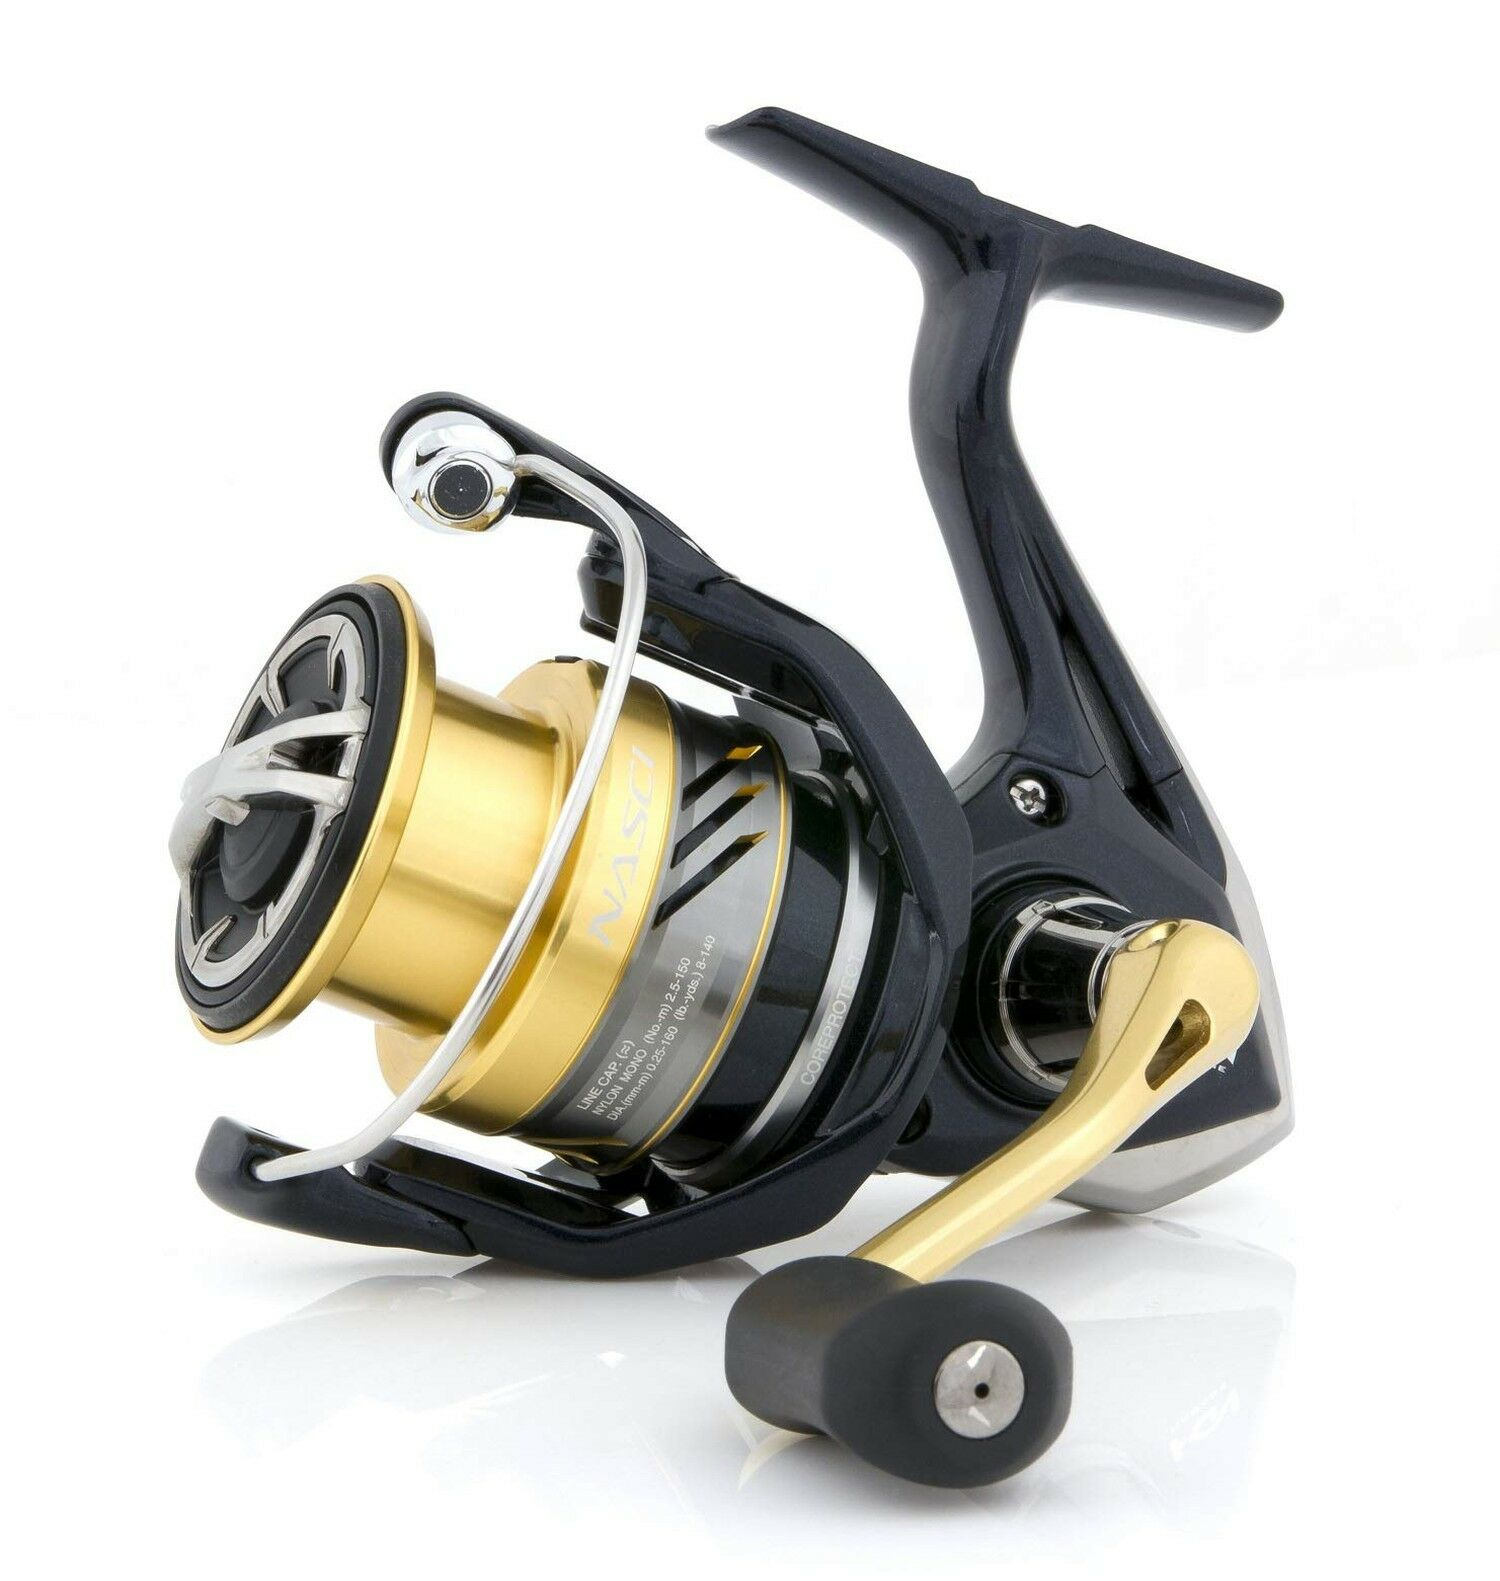 SHIMANO Nasci C 2000 S FB, Spinning Fishing Reel with Shallow Spool, NASC2000SFB